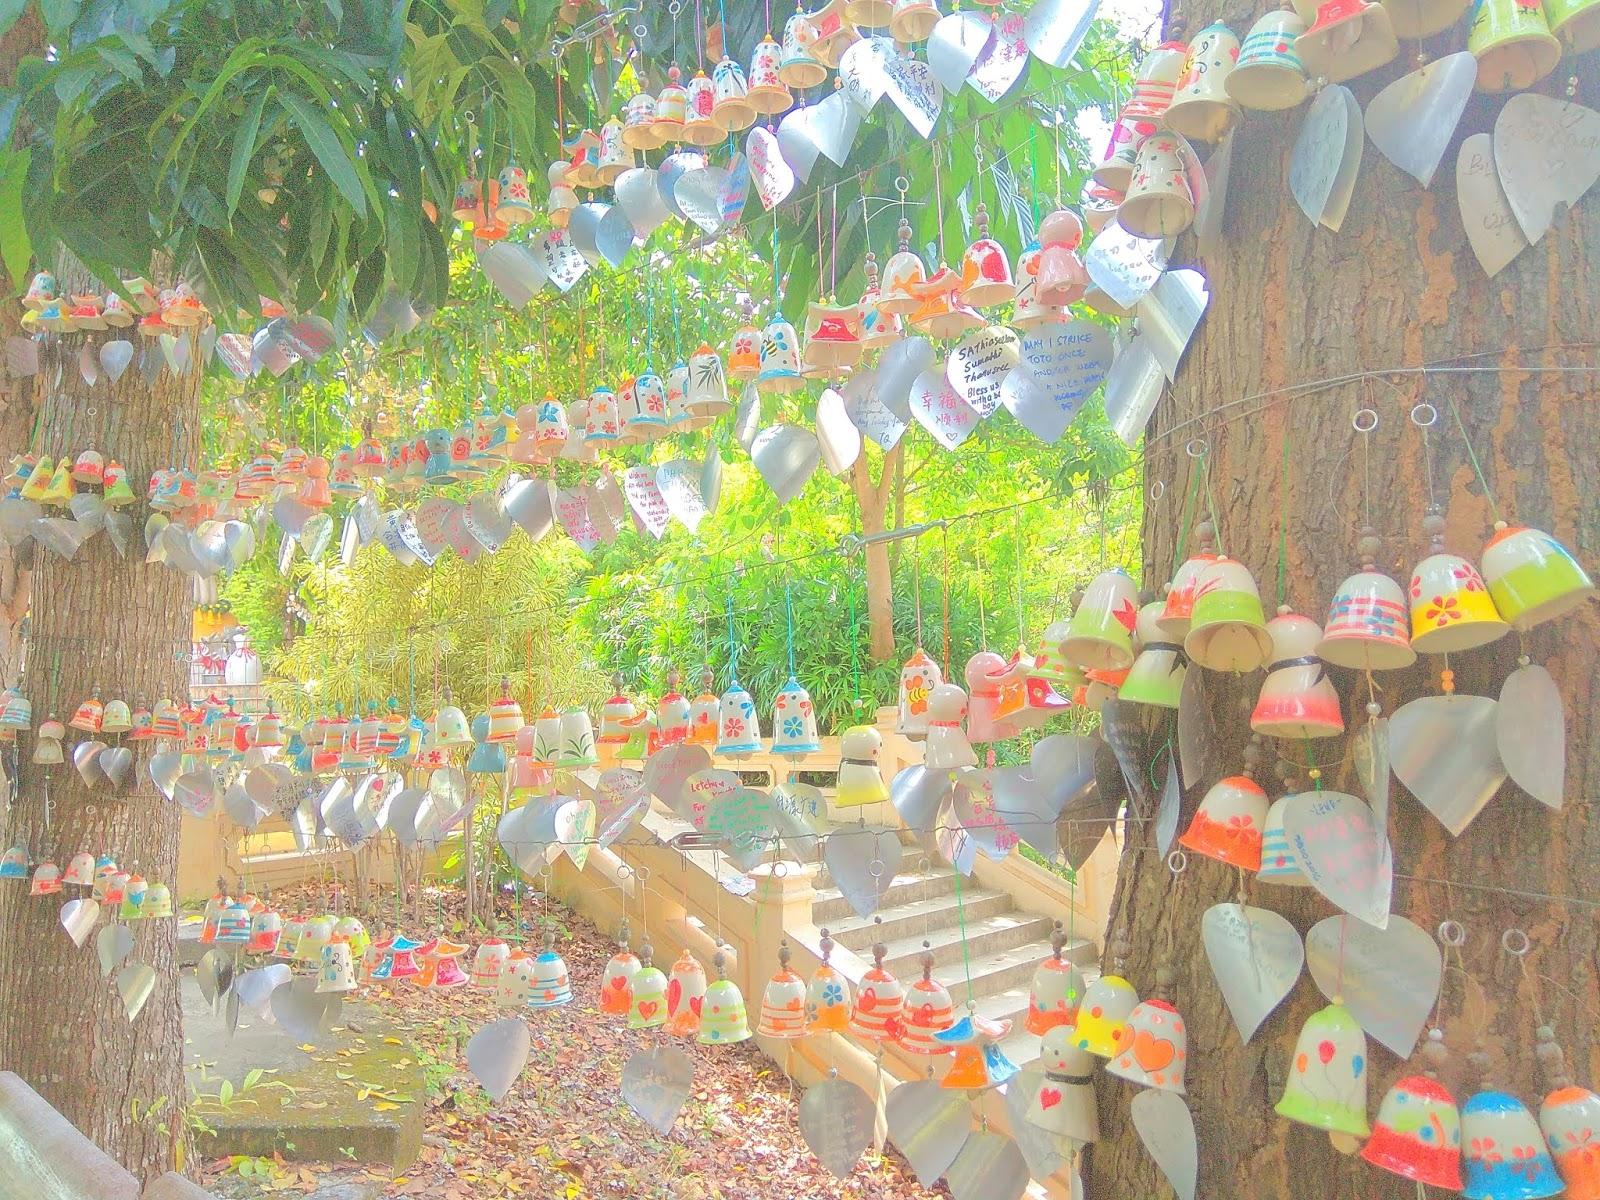 Vivians Diary Benih Biji Cabe Garda Fireworks Hatyai Municipal Park Wishing Bell